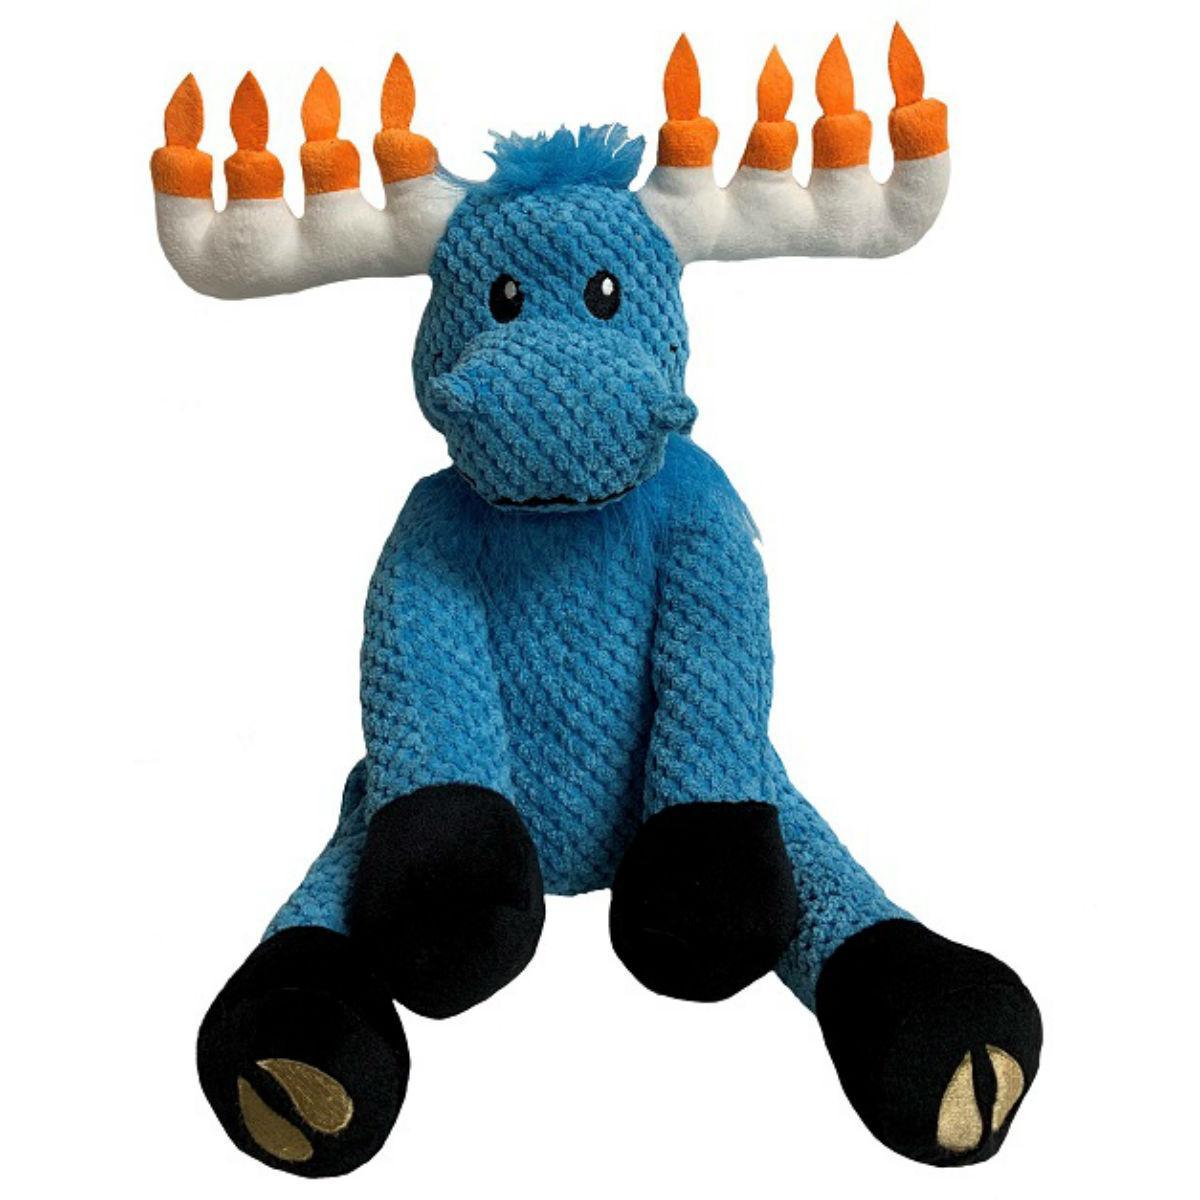 fabdog® Holiday Floppy Friends Dog Toy - Hanukkah Moose